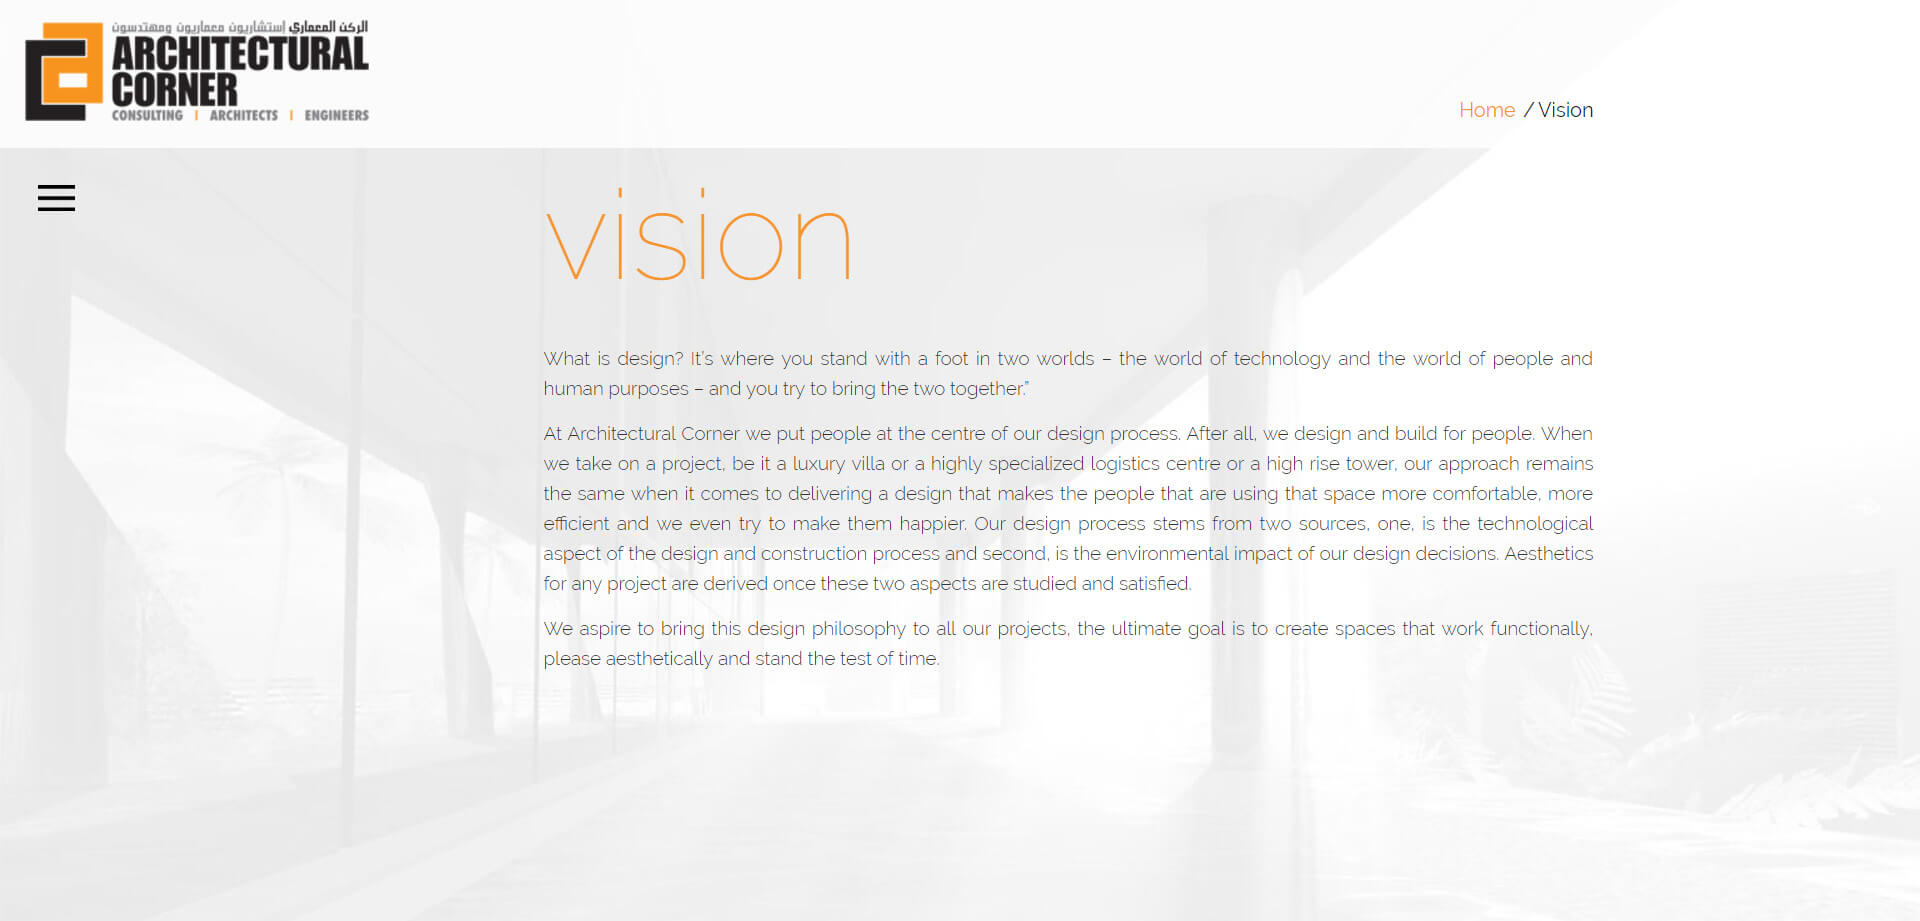 architectural corner vision design